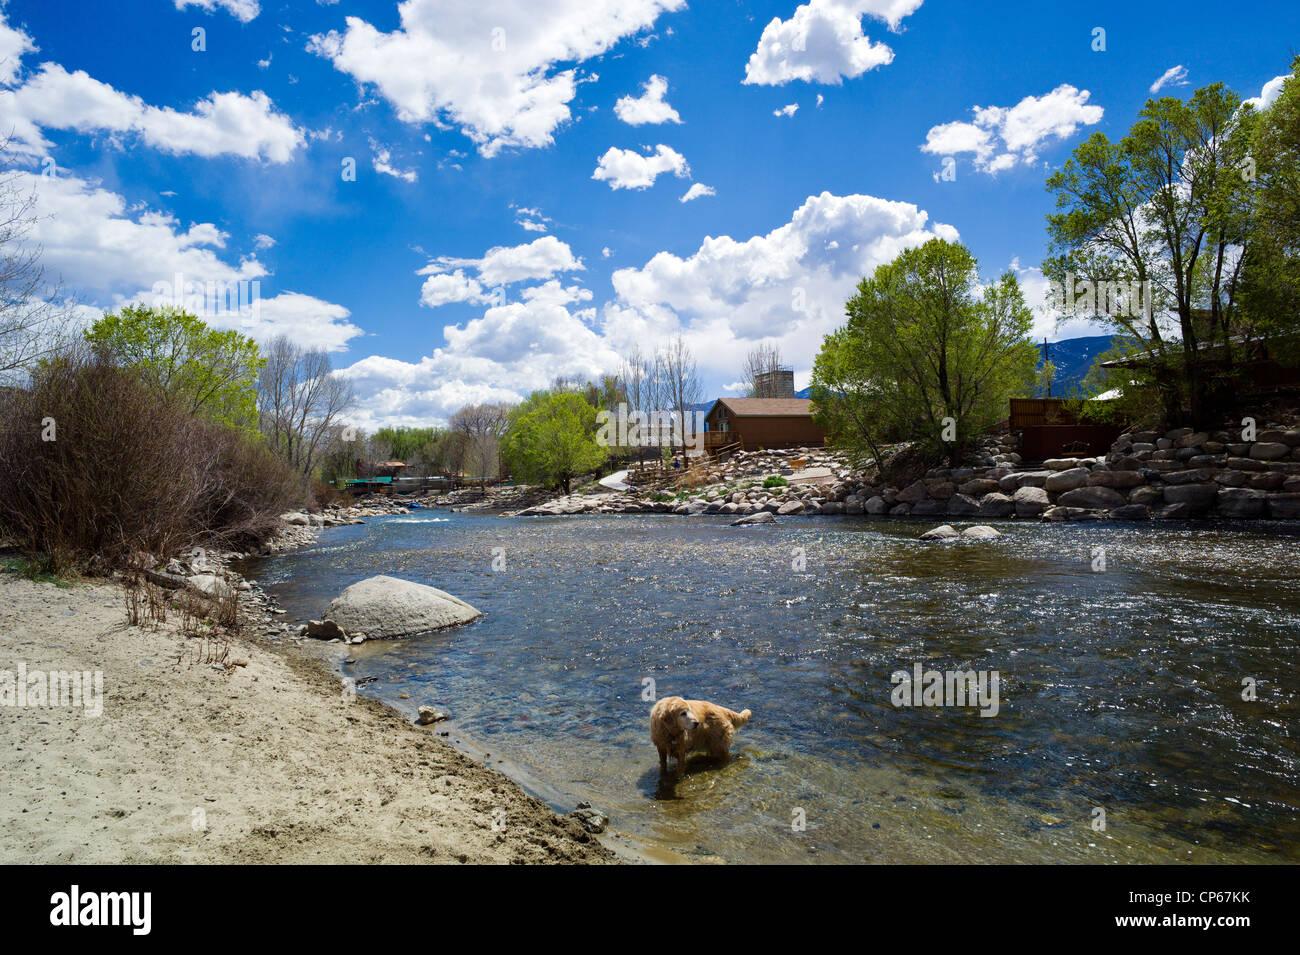 Ruby, a Golden Retriever dog, playing alongside the sun lit Arkansas River, Salida, Colorado, USA - Stock Image